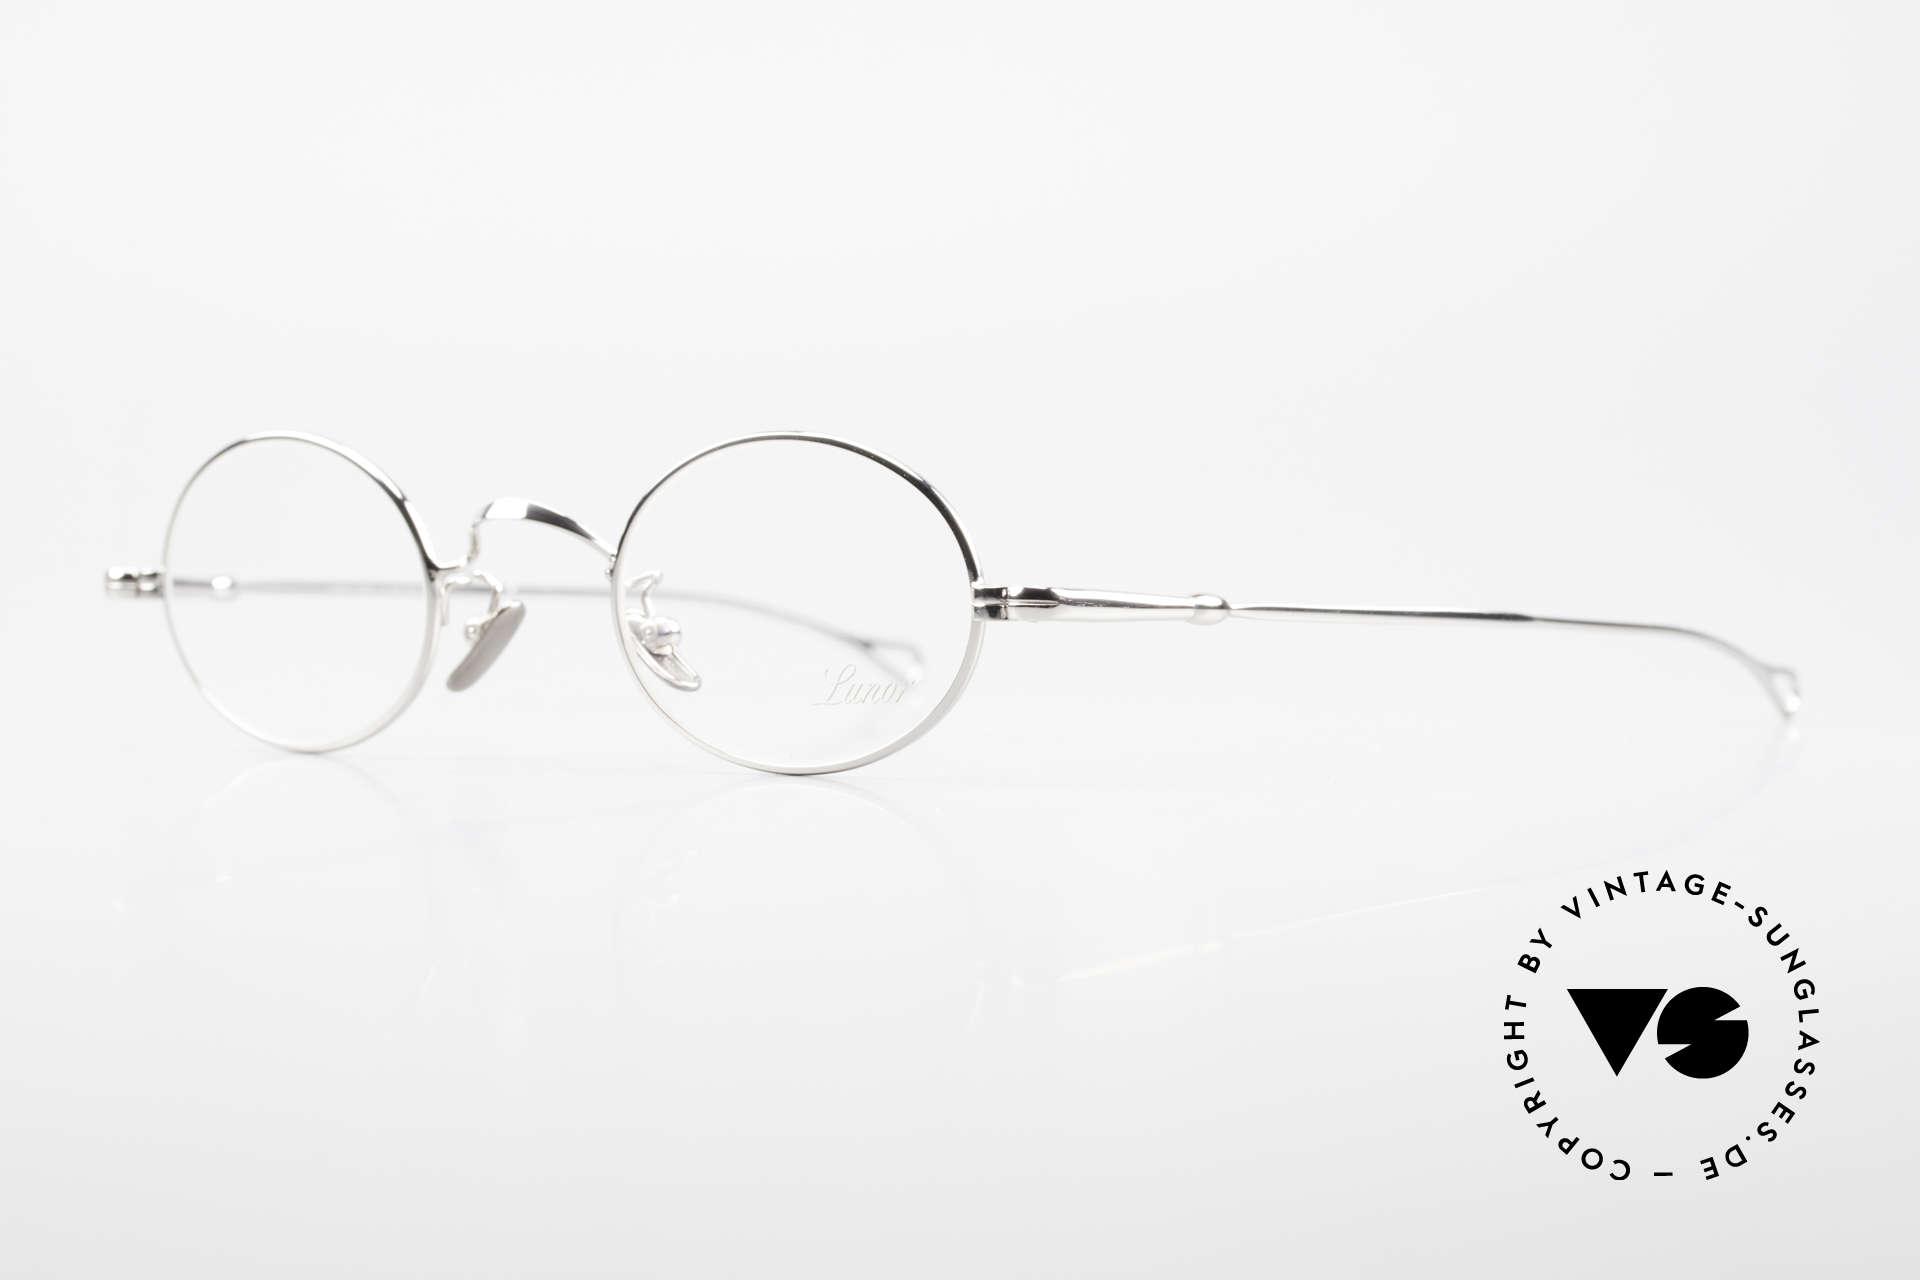 Lunor V 100 Oval Vintage Lunor Glasses, model V100: timeless oval eyeglass-frame (unisex specs), Made for Men and Women